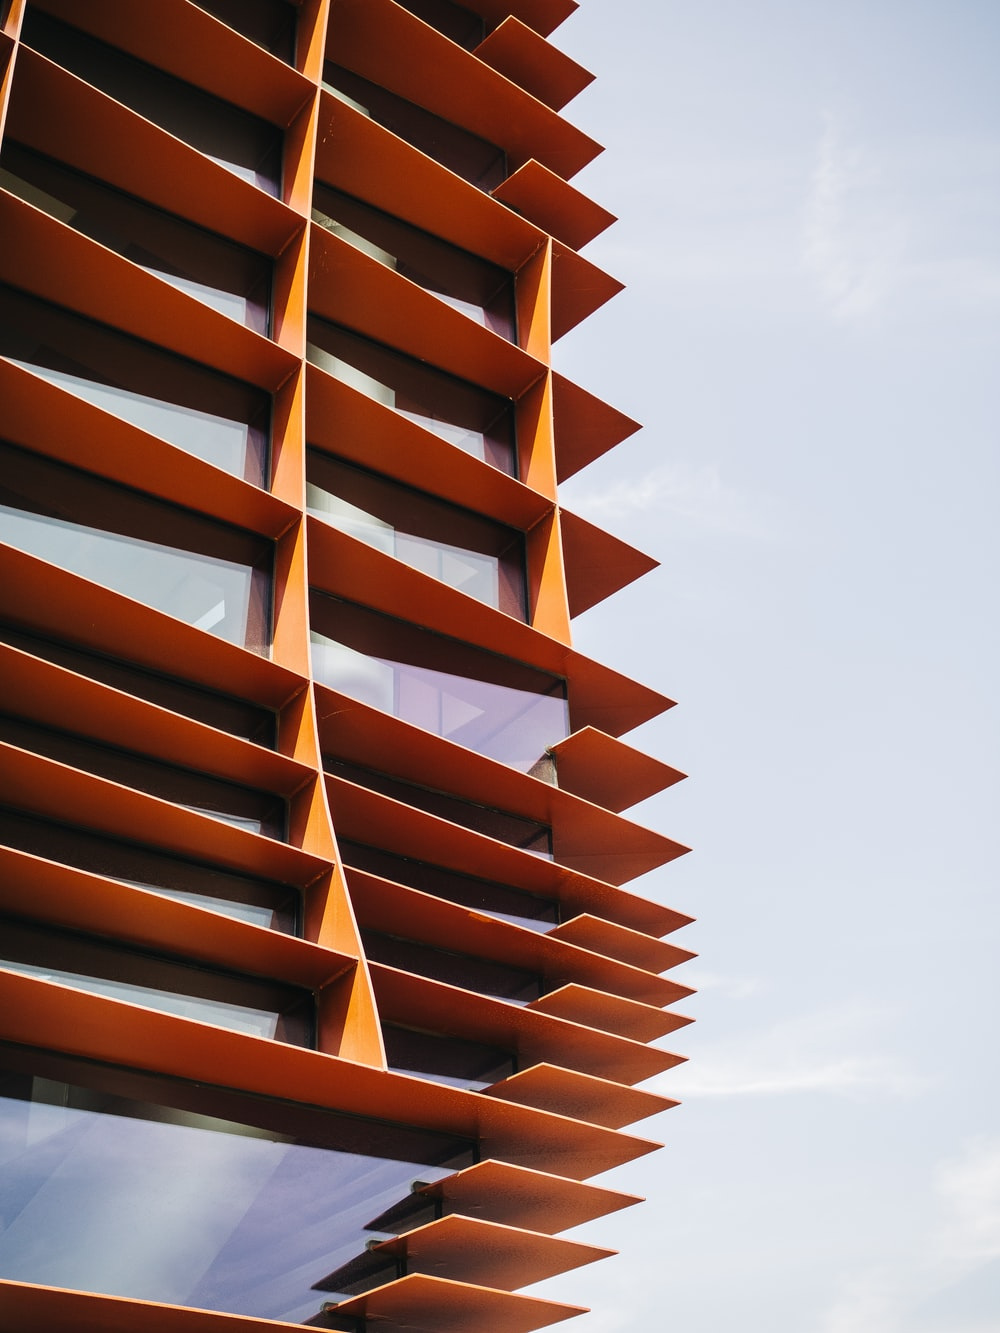 photo of orange painted building